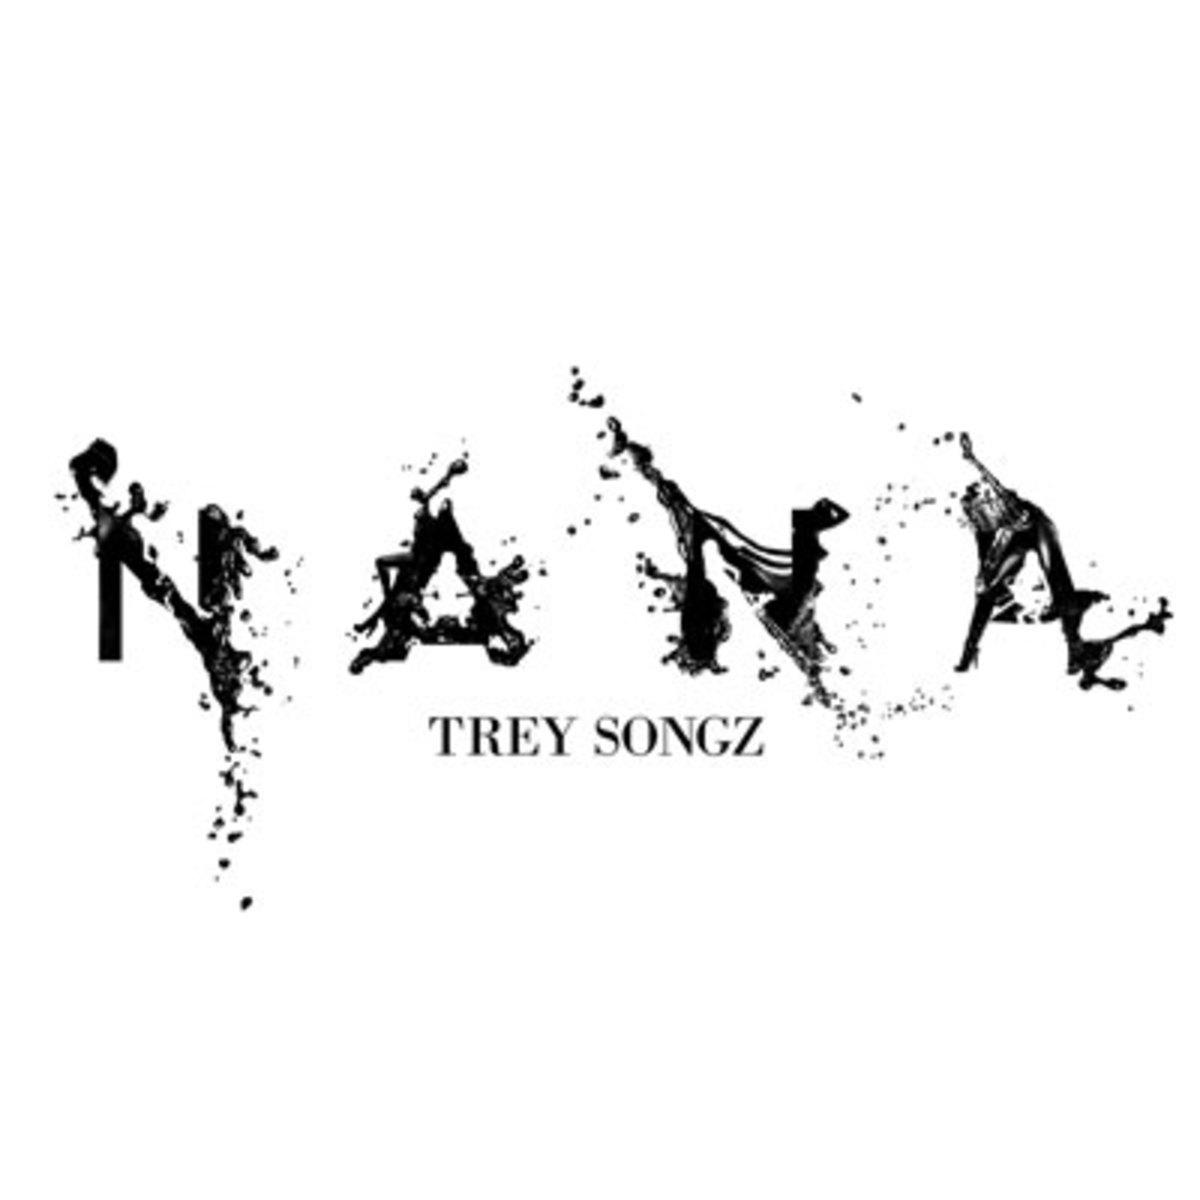 treysongz-nana.jpg